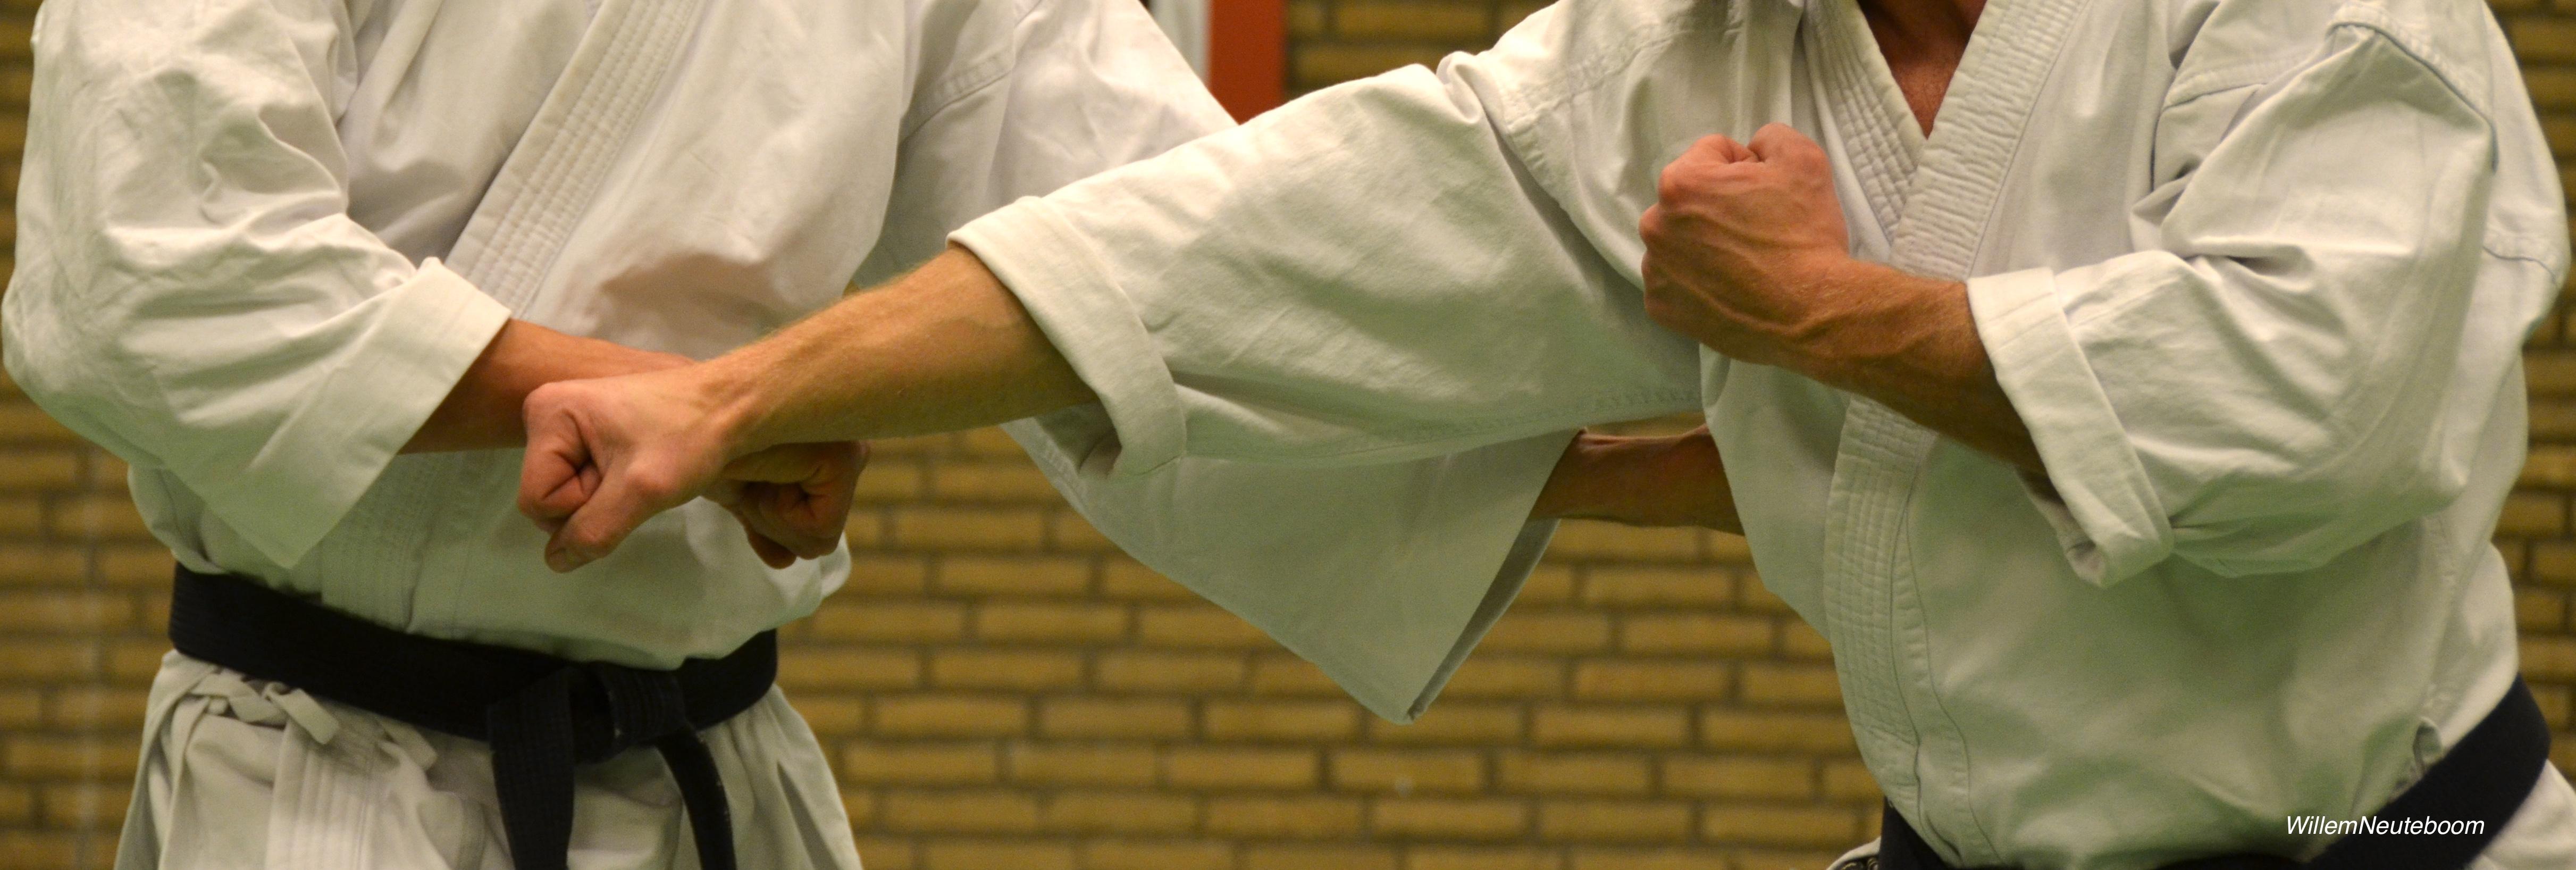 DSC_0210-1 Karate A&E+tag